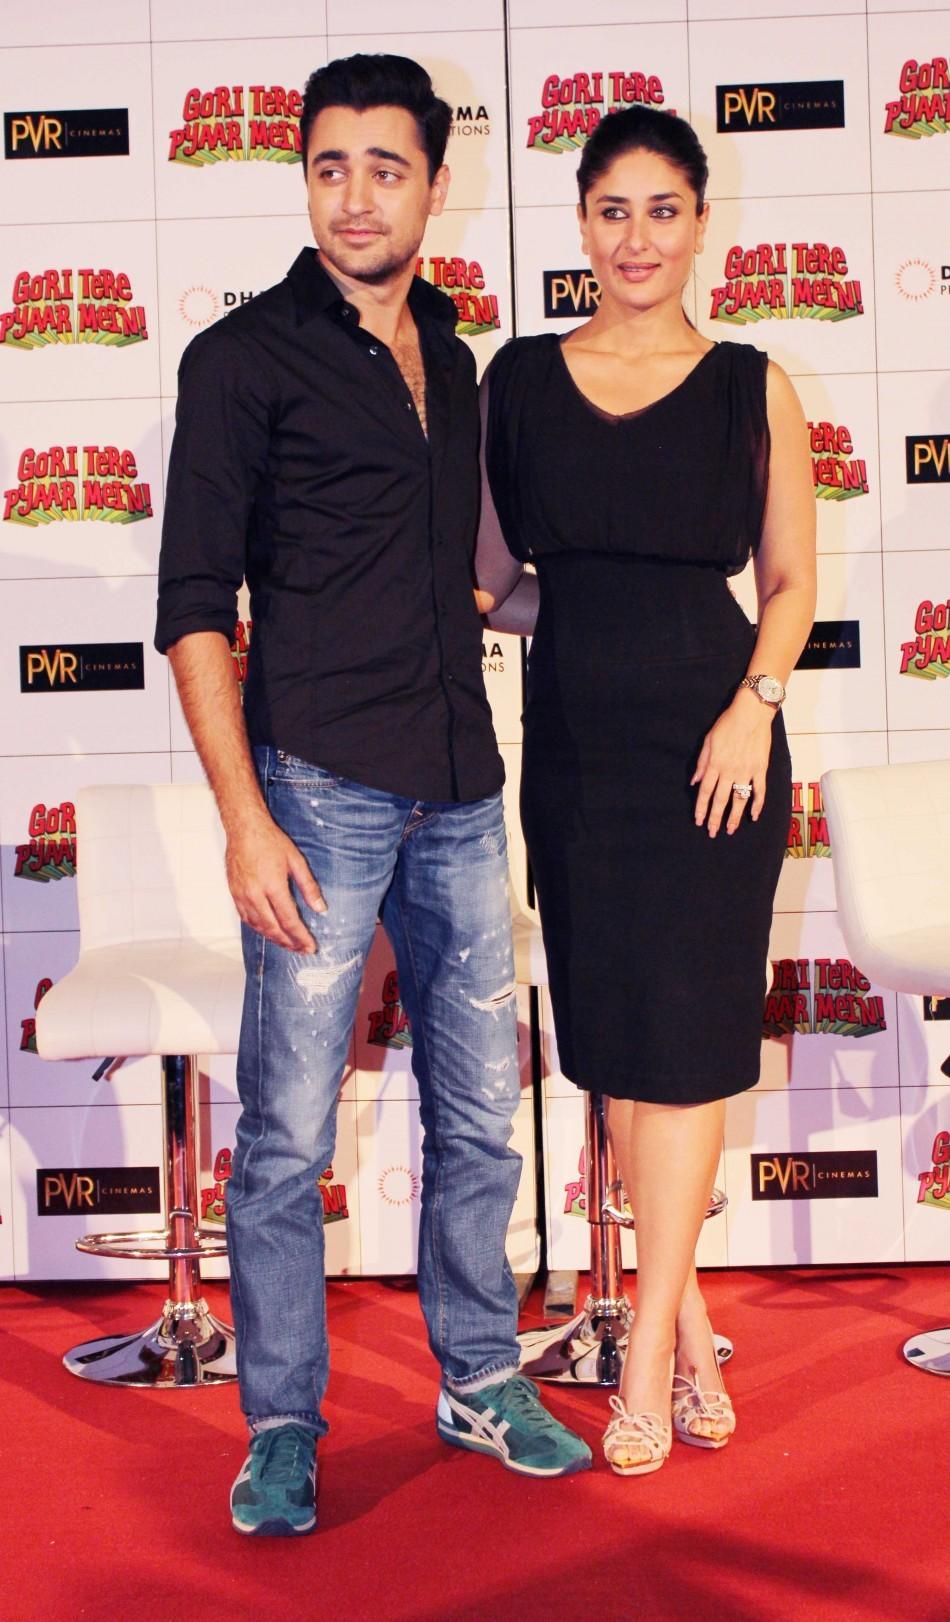 Kareena Kapoor and Imran Khan at Gori Tere Pyaar Mein Event ( Varinder Chawla)